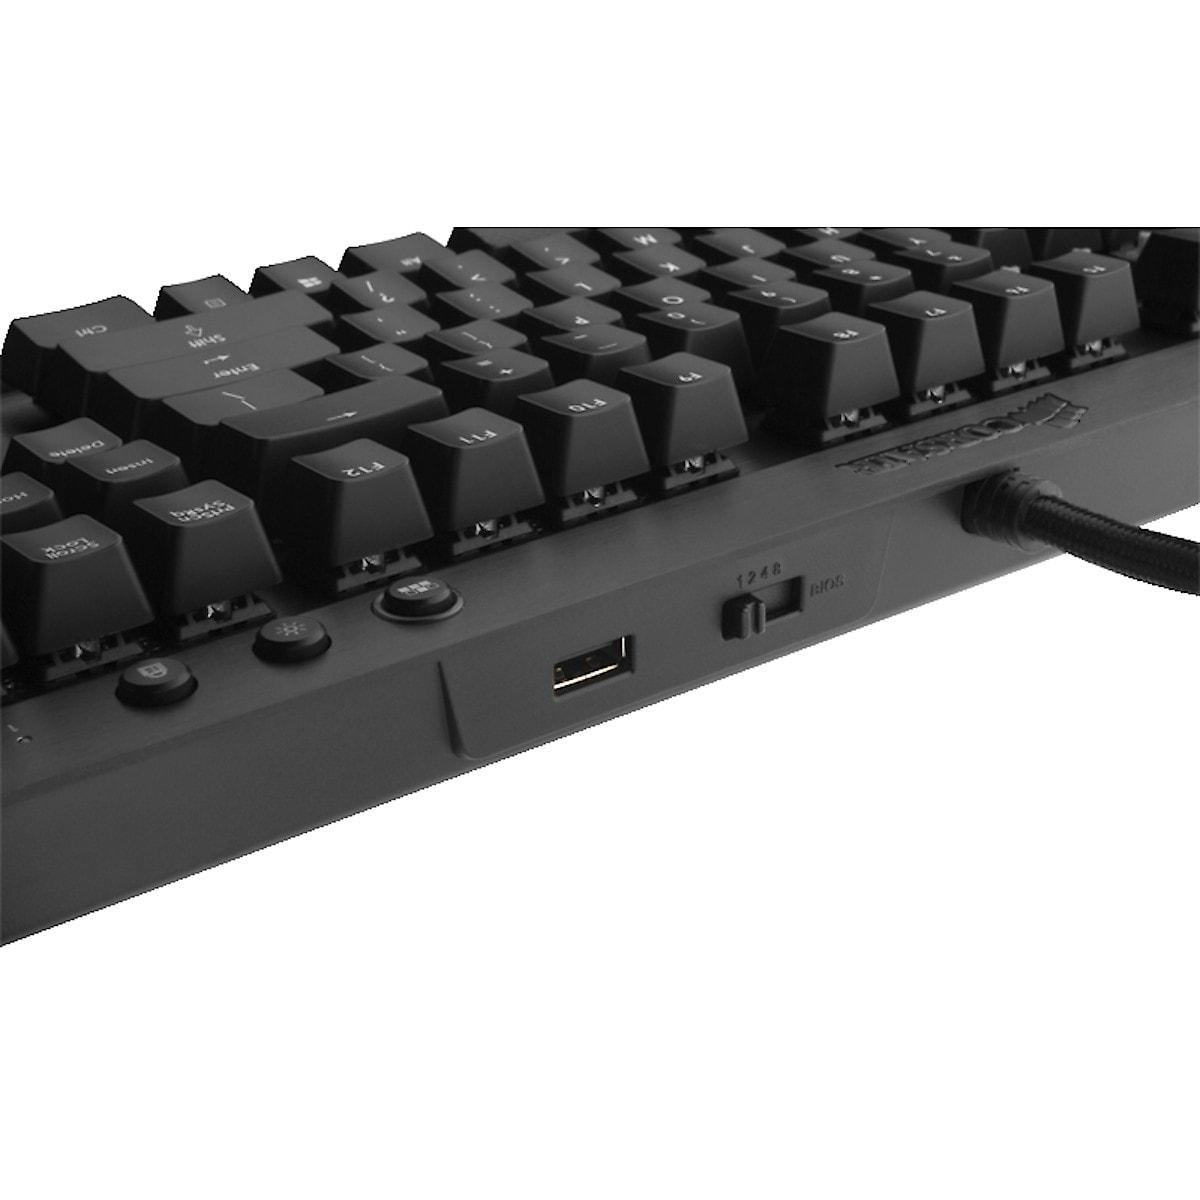 Corsair Vengeance K70 Gaming Keyboard